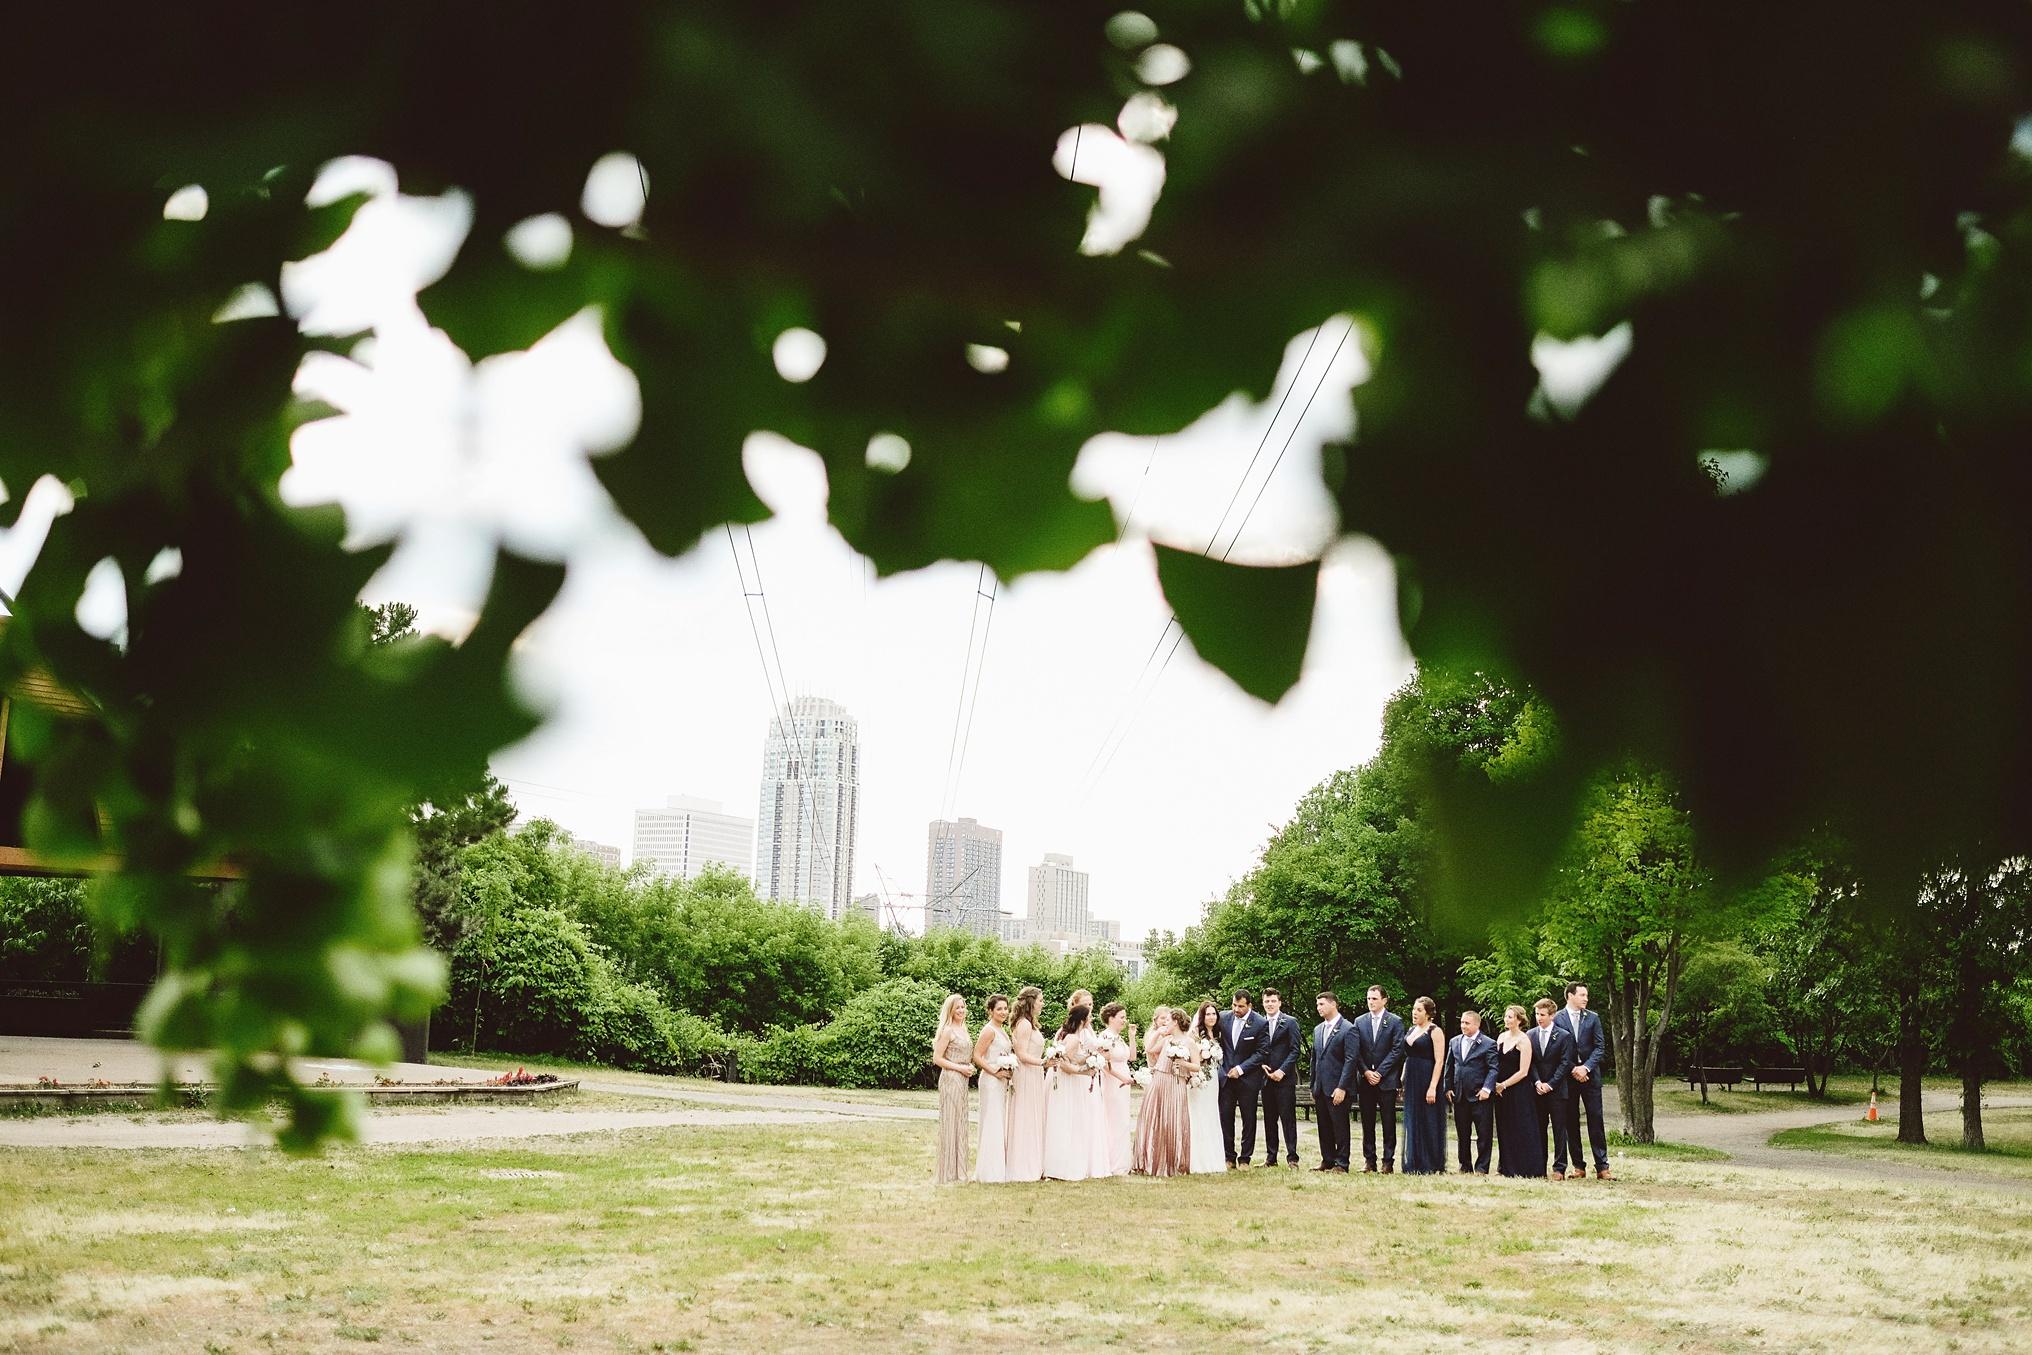 best_wedding_photography_2017_by_lucas_botz_photography_142.jpg